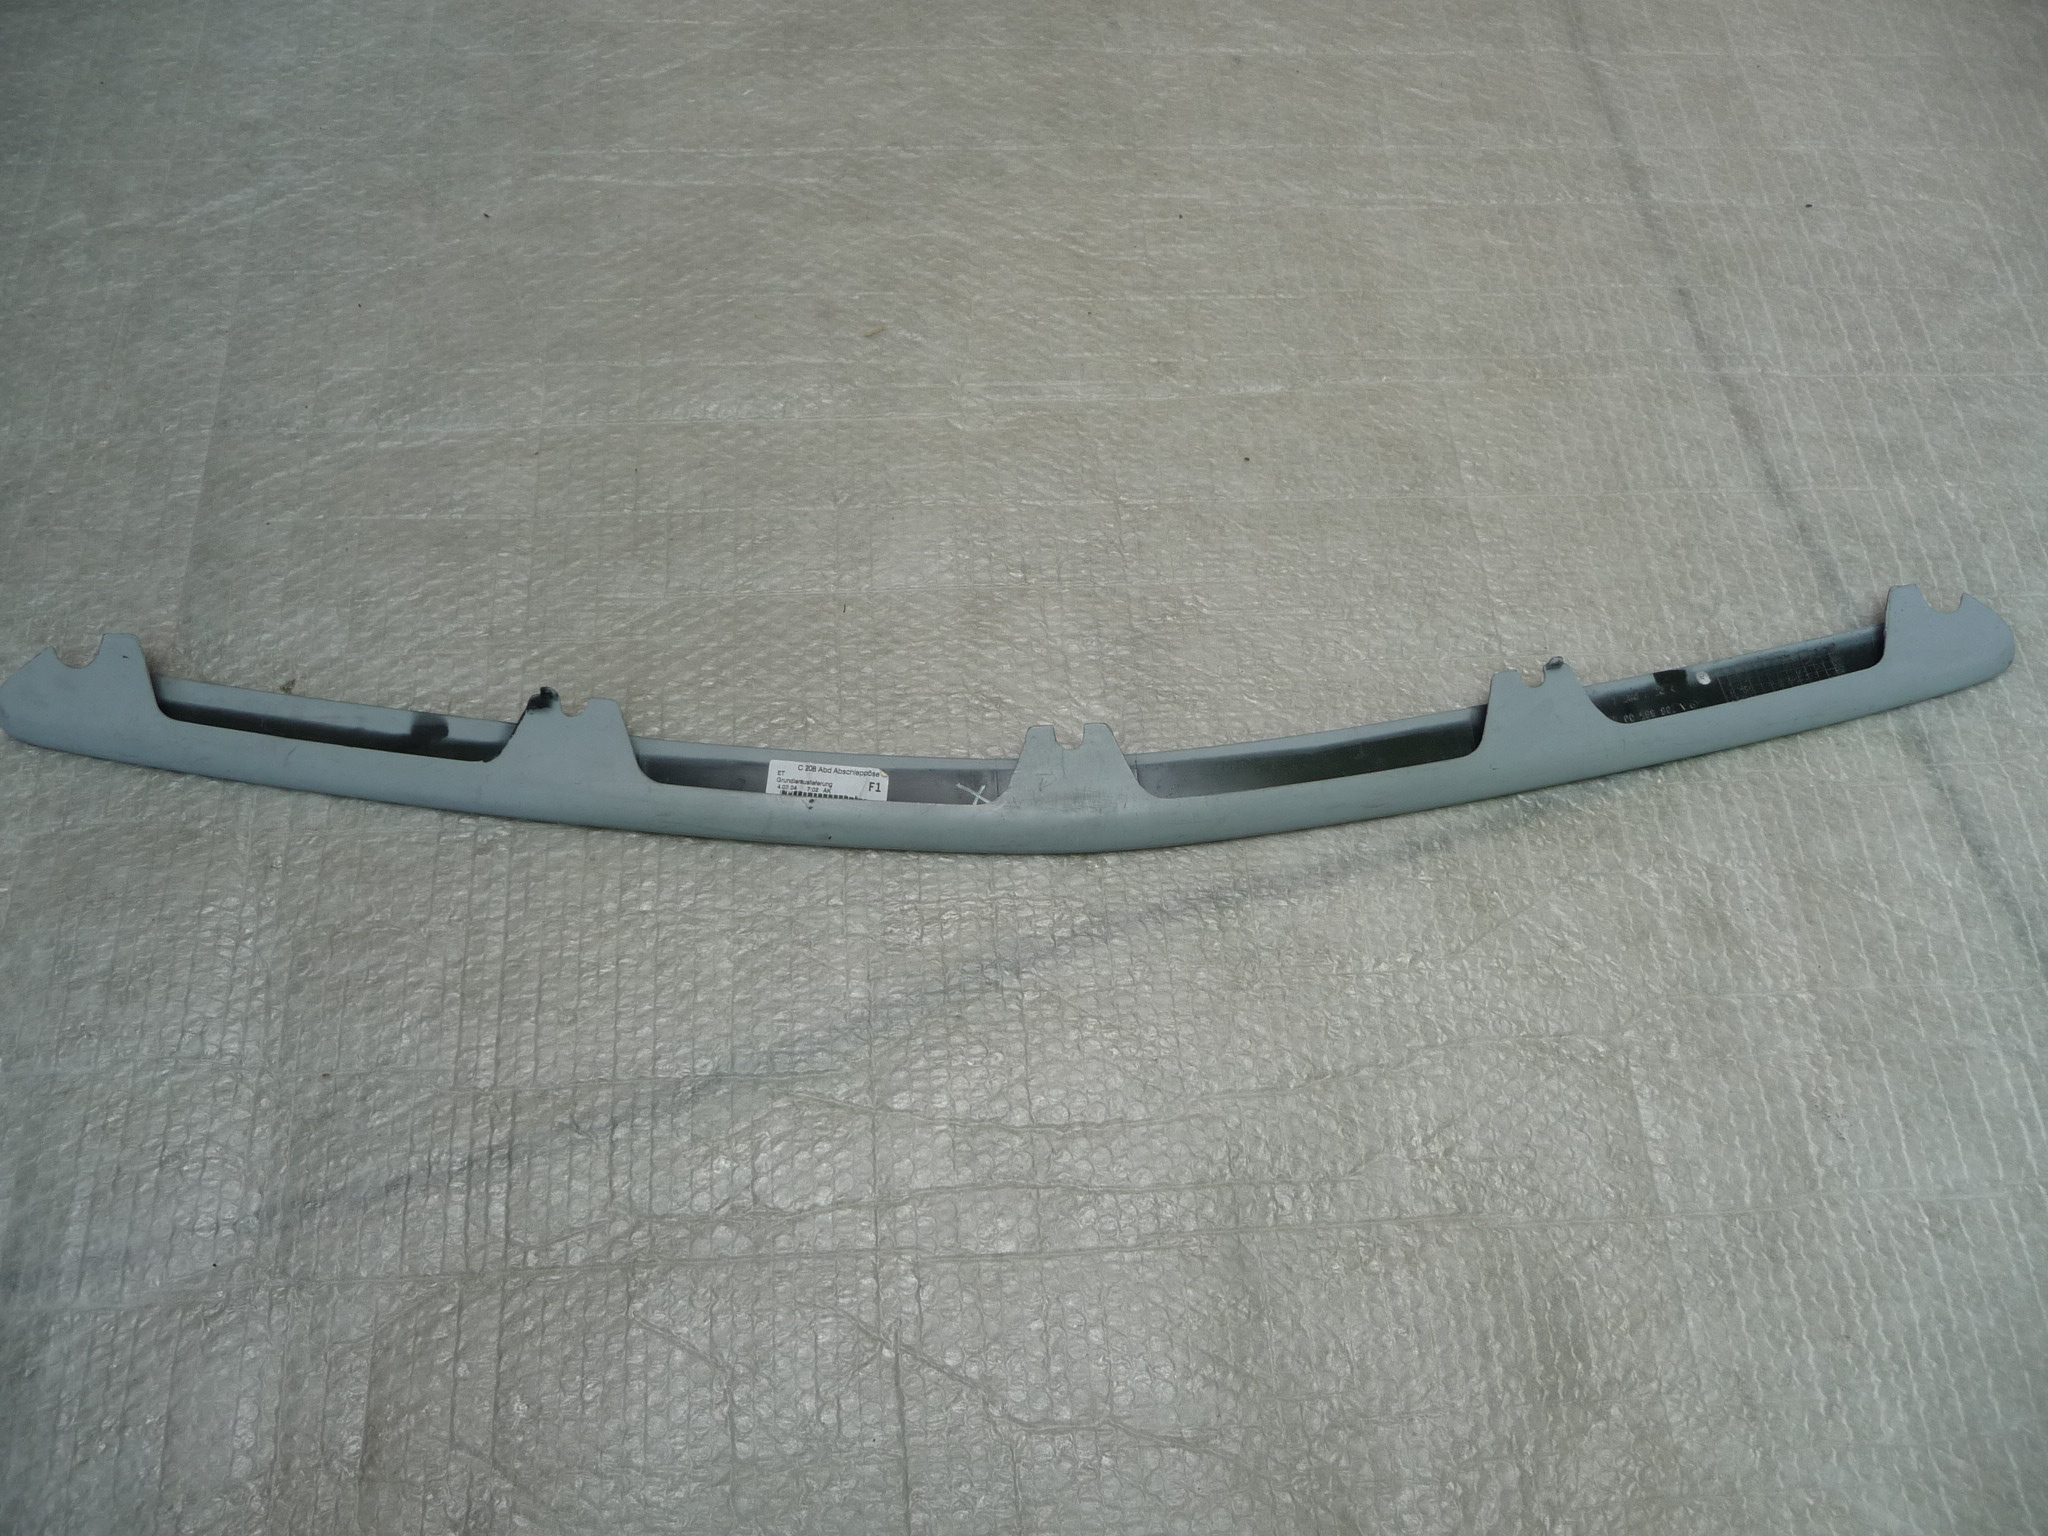 Mercedes Benz C208 CLK-Class Front Bumper Center Cover A2088850022 OEM OE